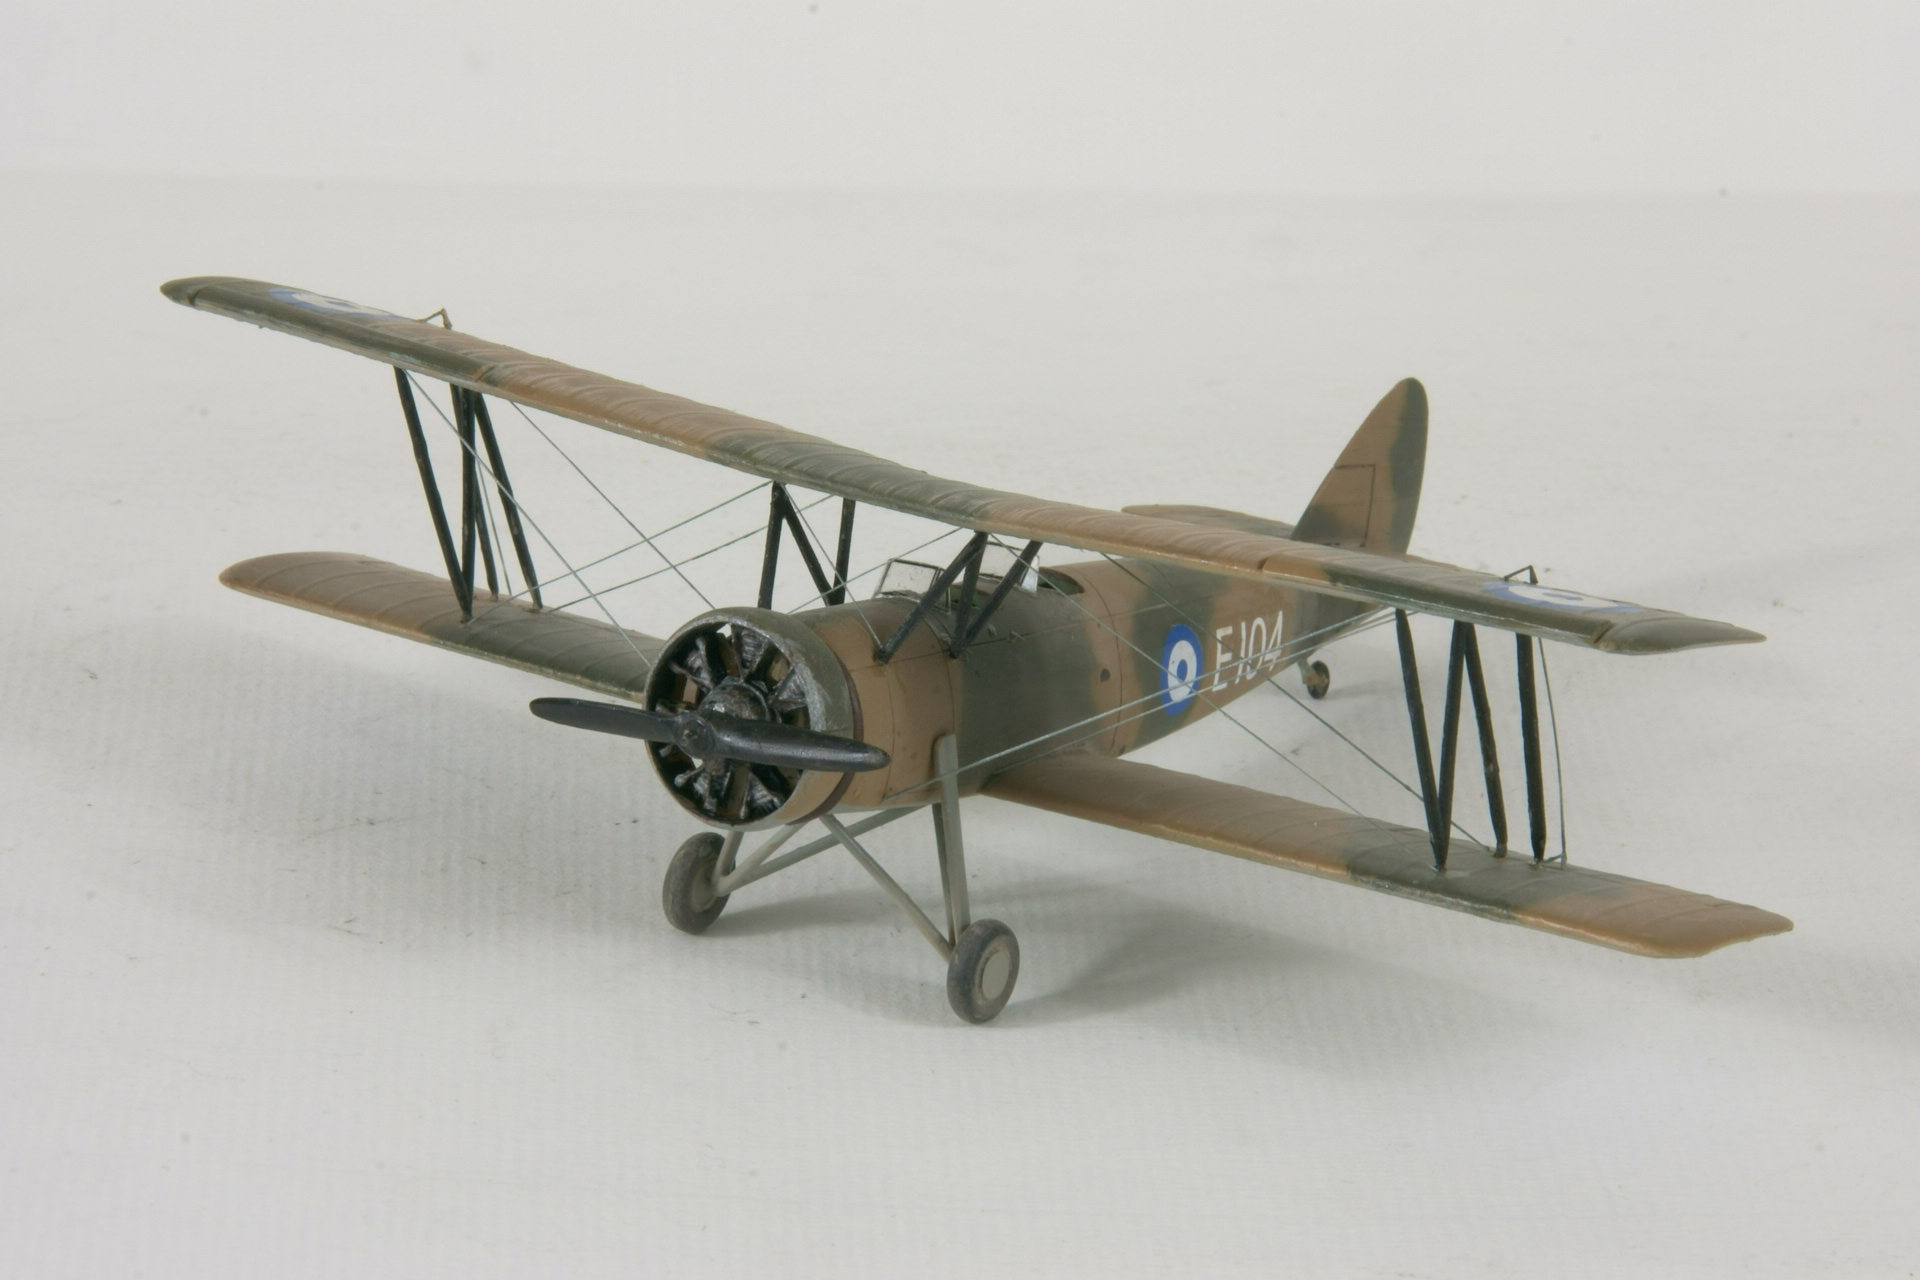 Avro 621 tutor 6